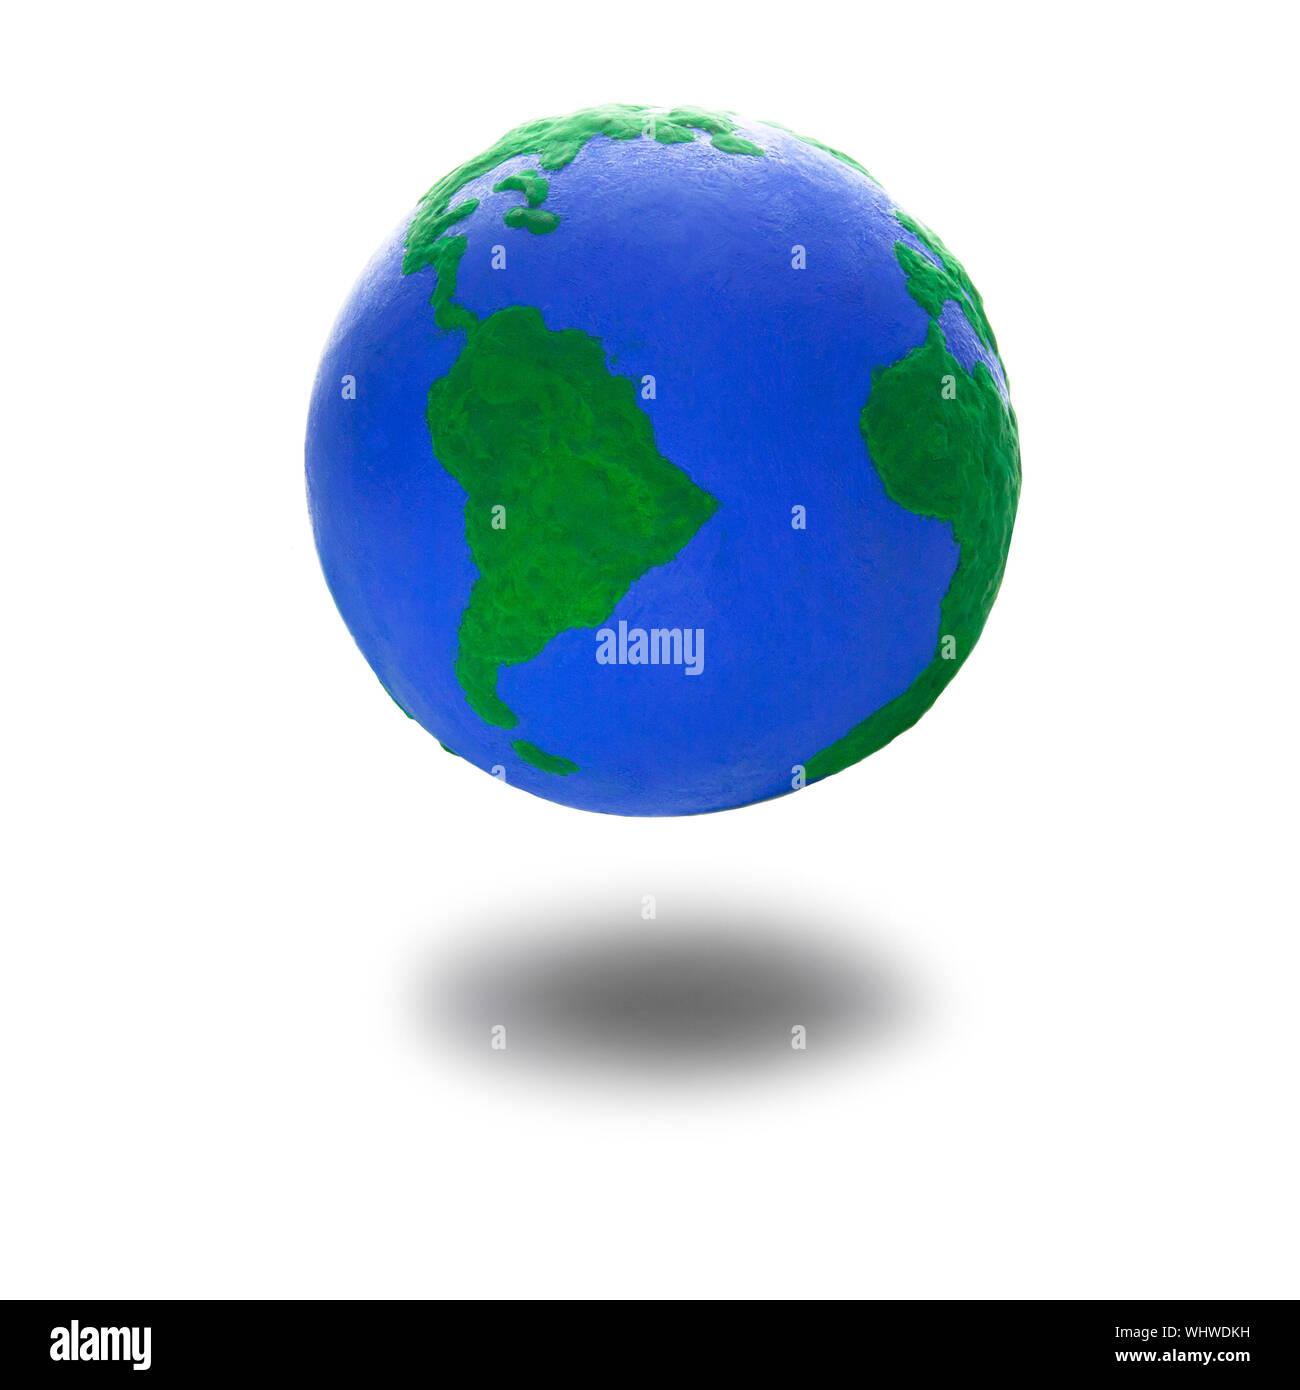 Globus Karte.Earth Globus Karte Seite Des Nord Und Sudamerika Textur